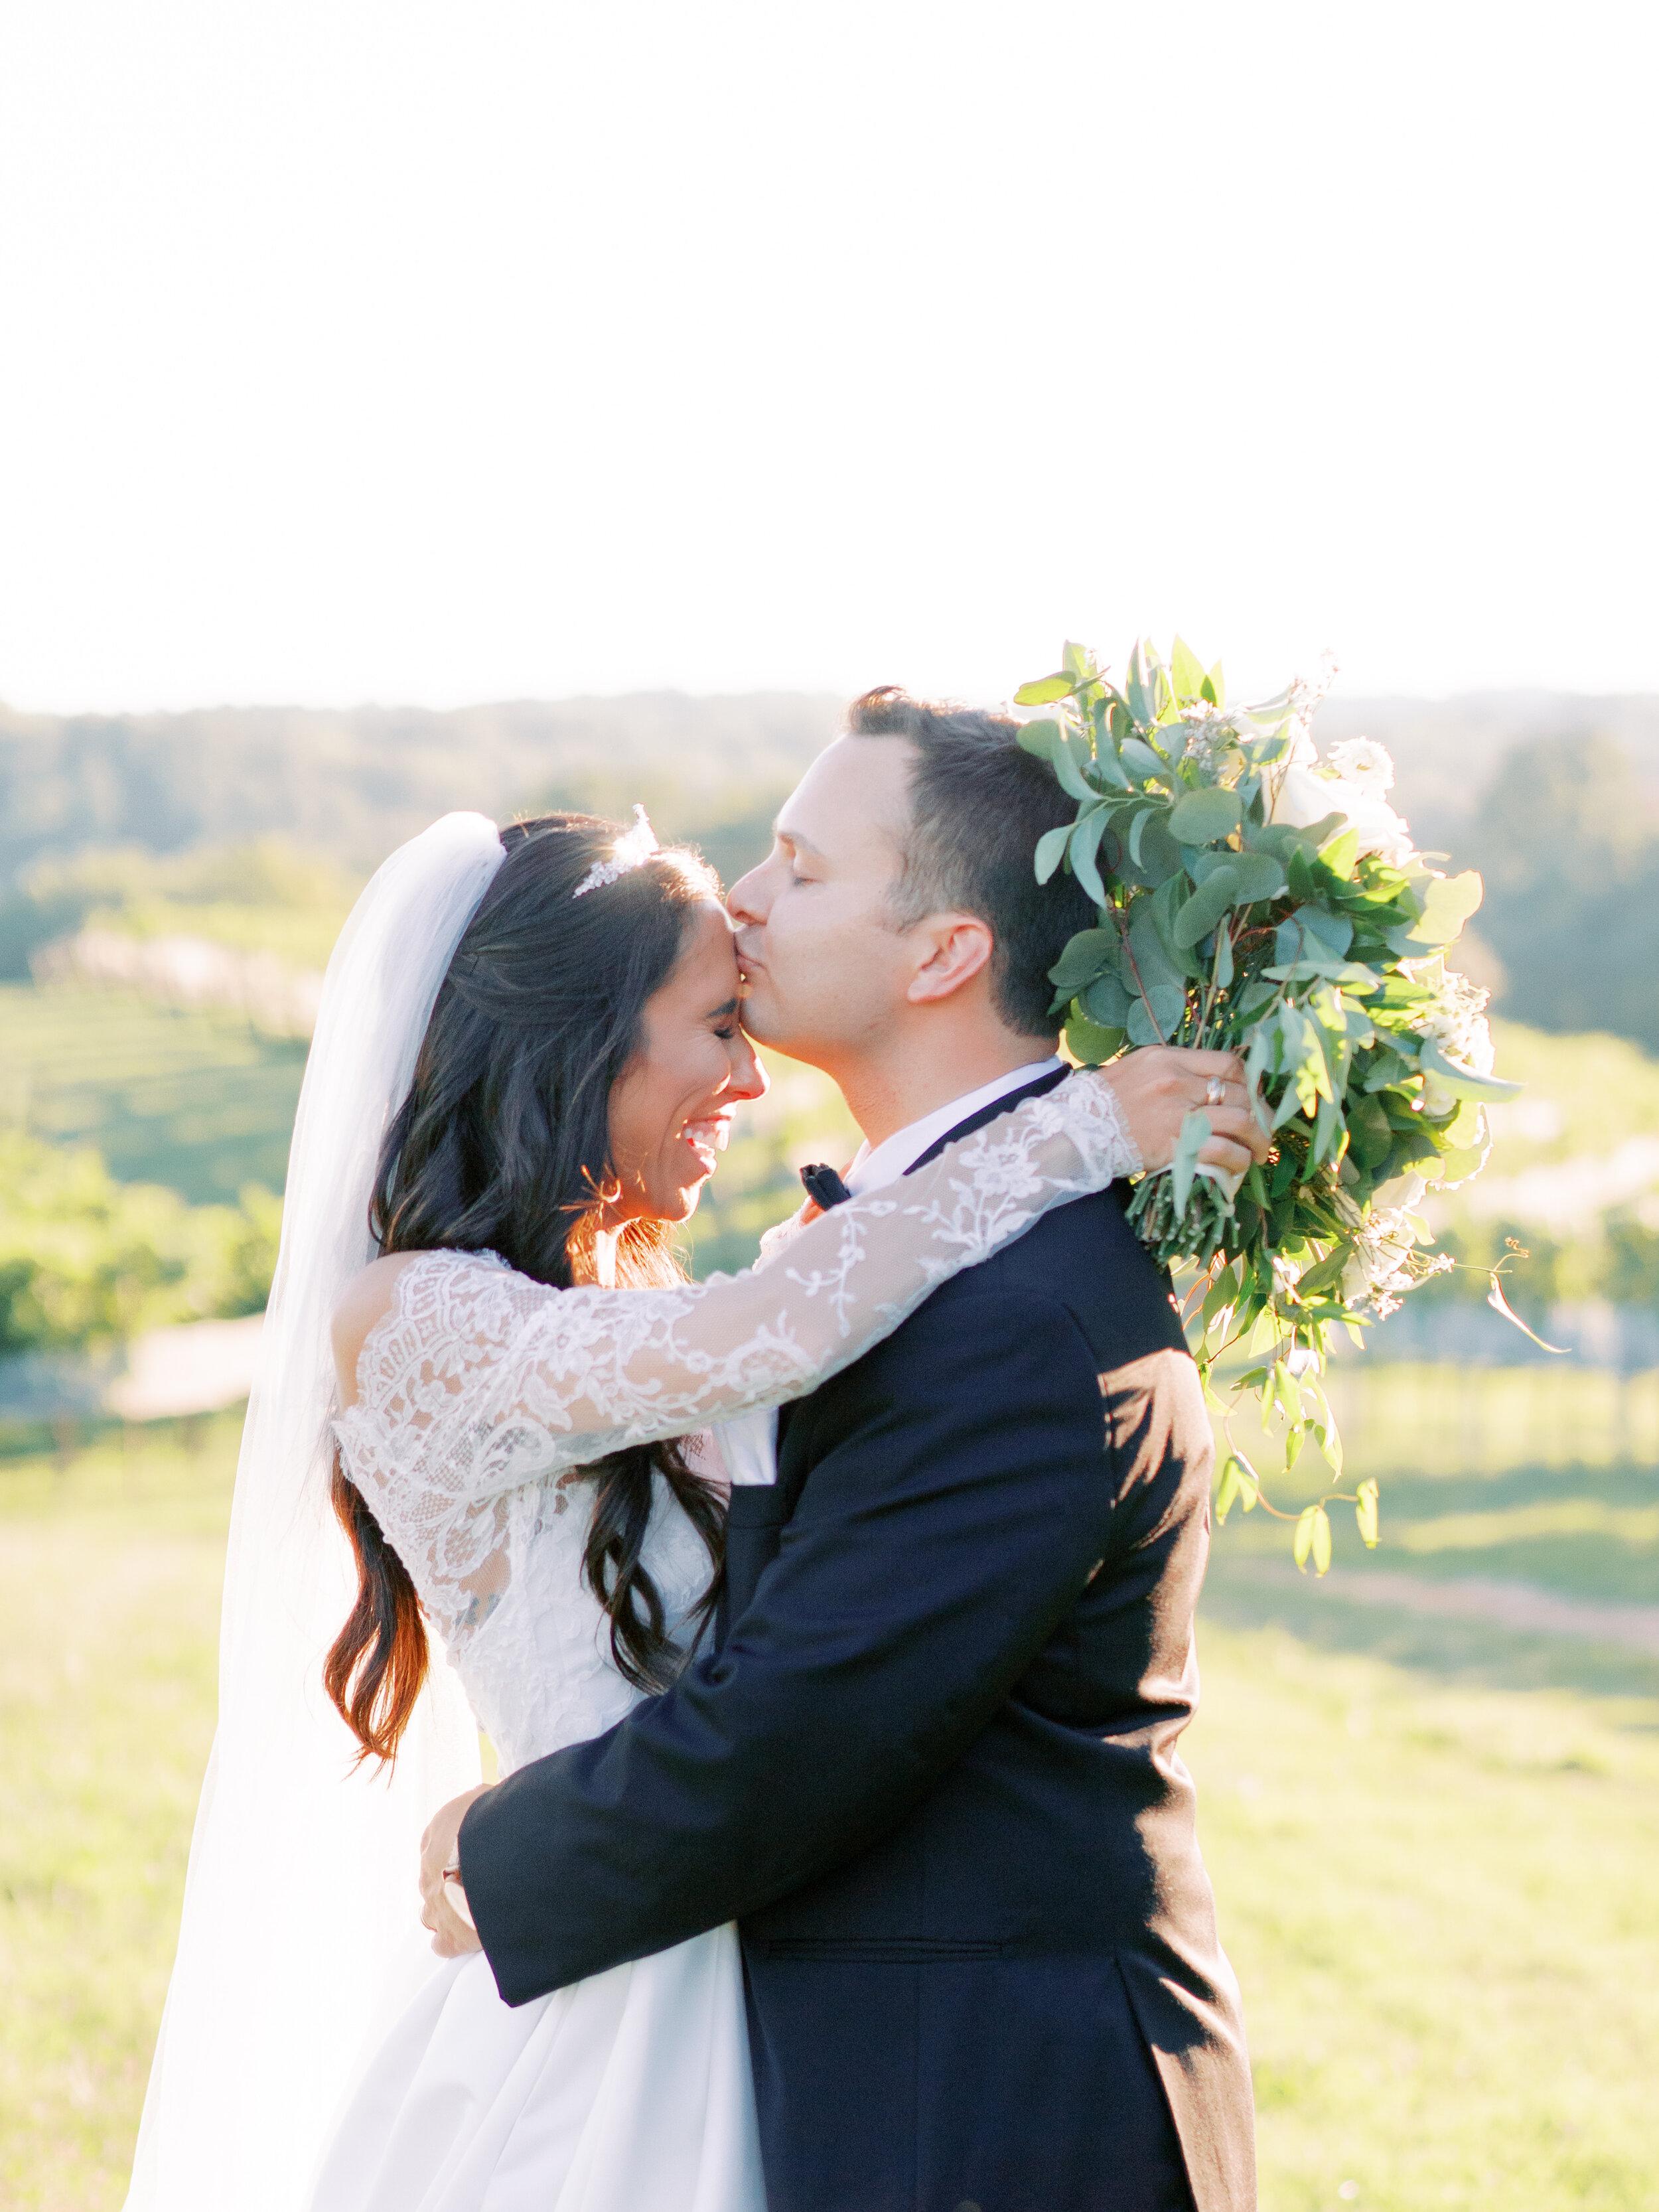 montaluce-winery-wedding-photography-dahlonega-hannah-forsberg-atlanta-film-wedding-photographer25.JPG